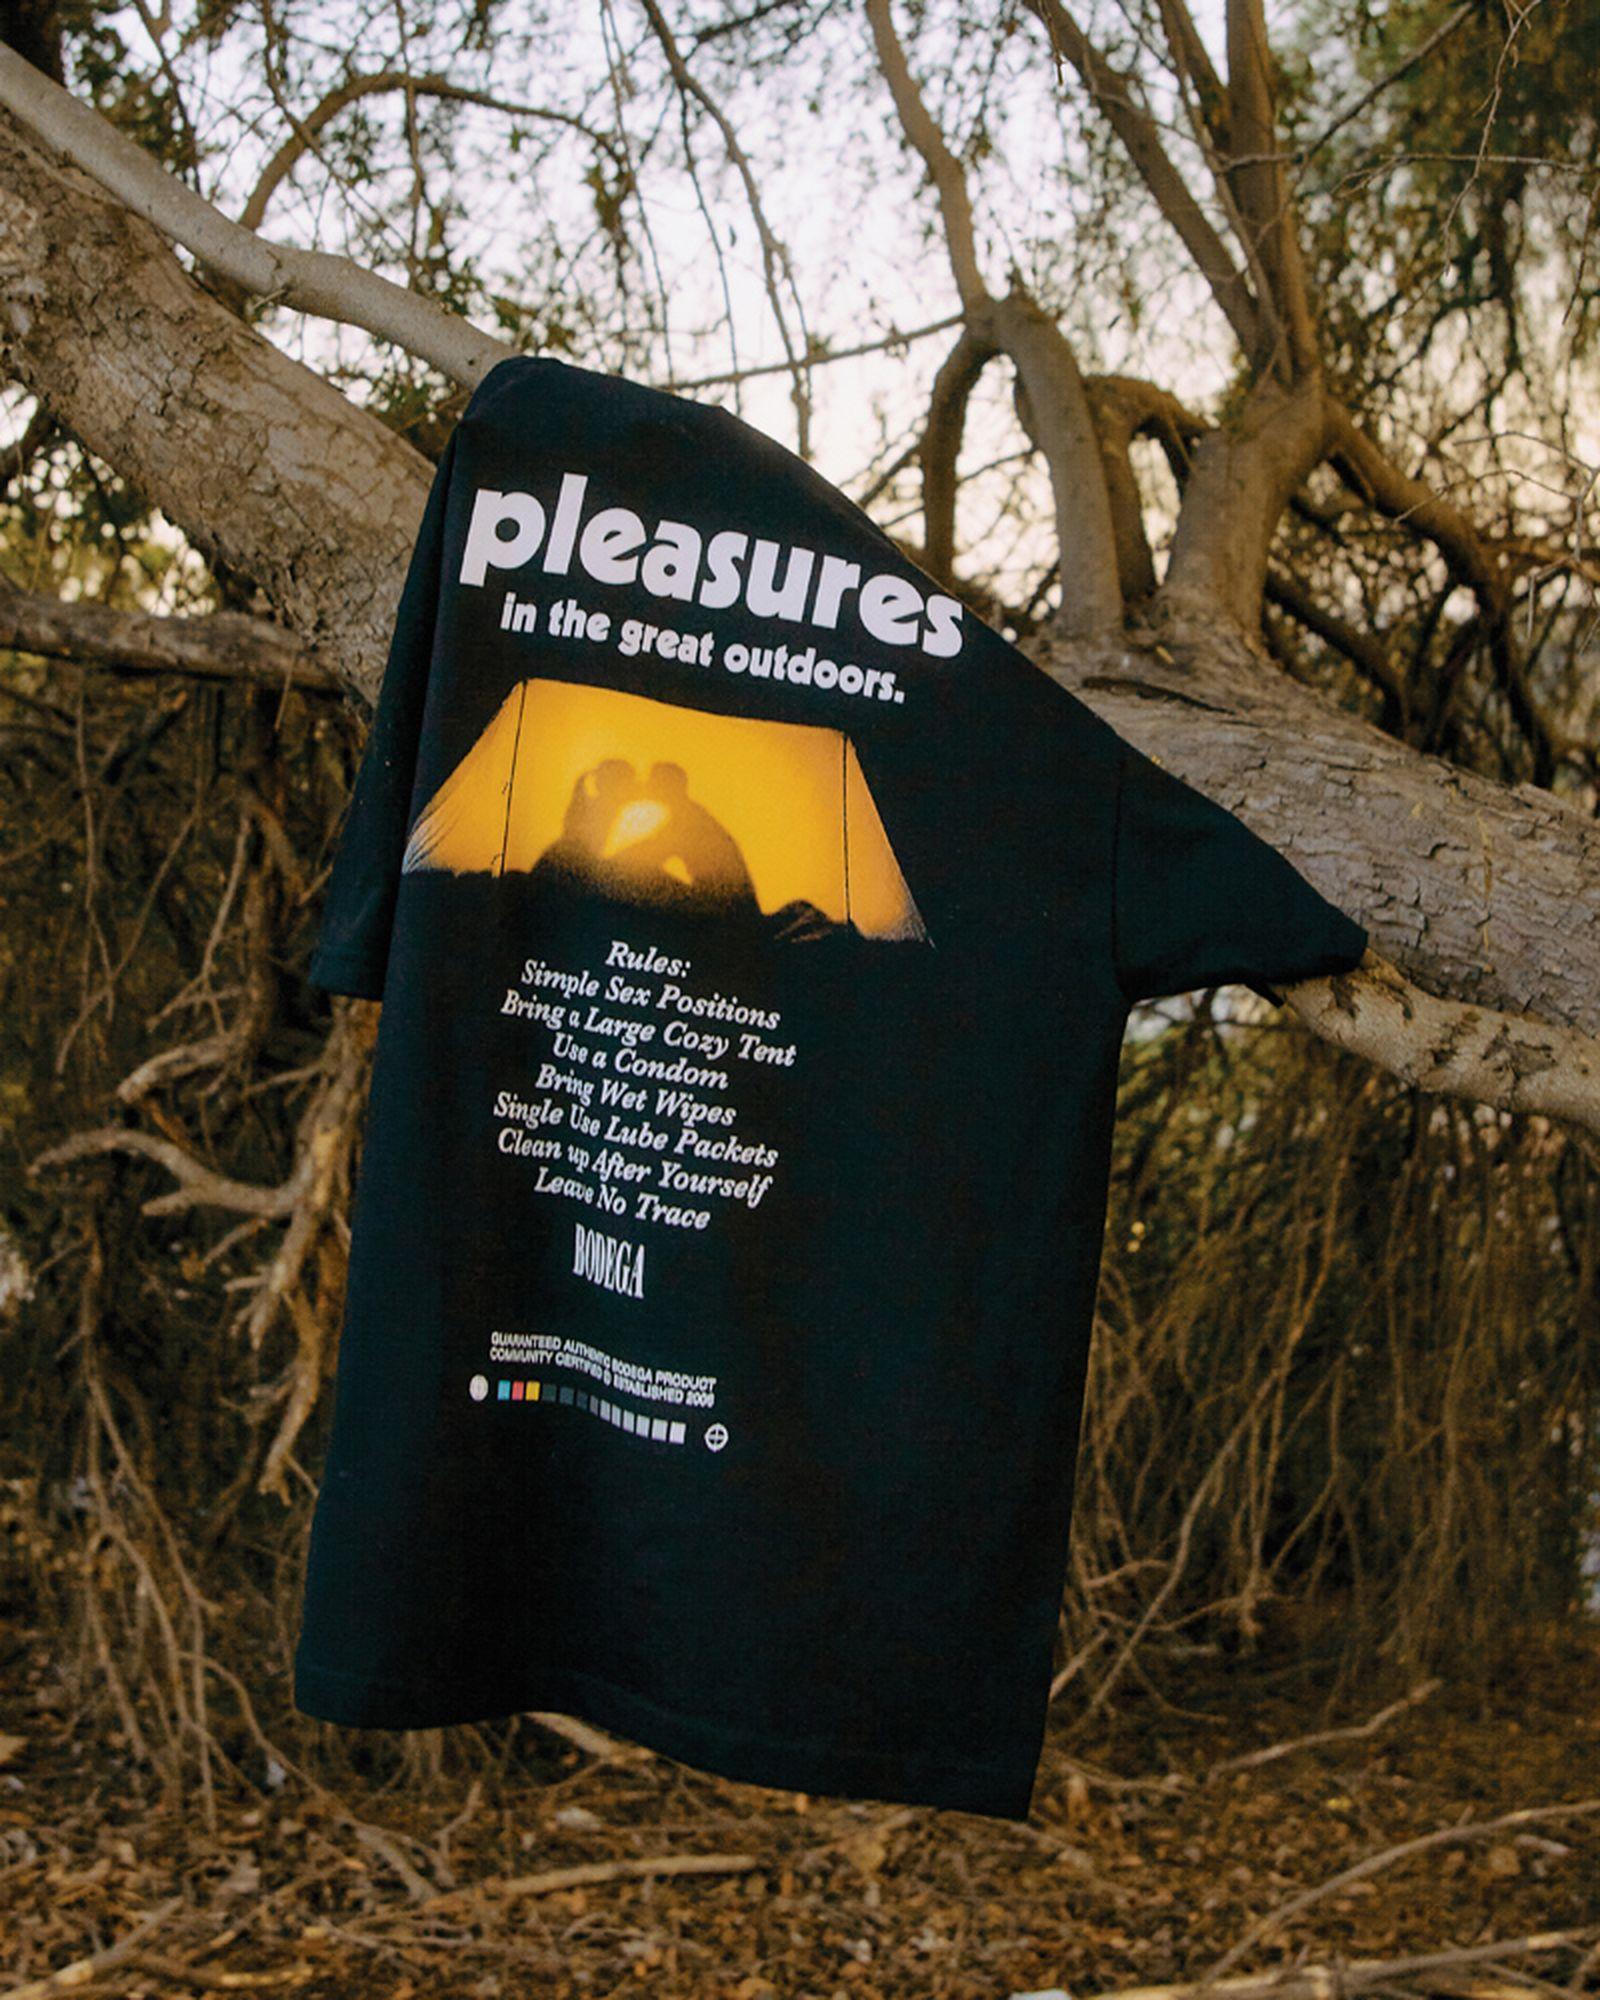 bodega-pleasures-anniversary-capsule-collection-15